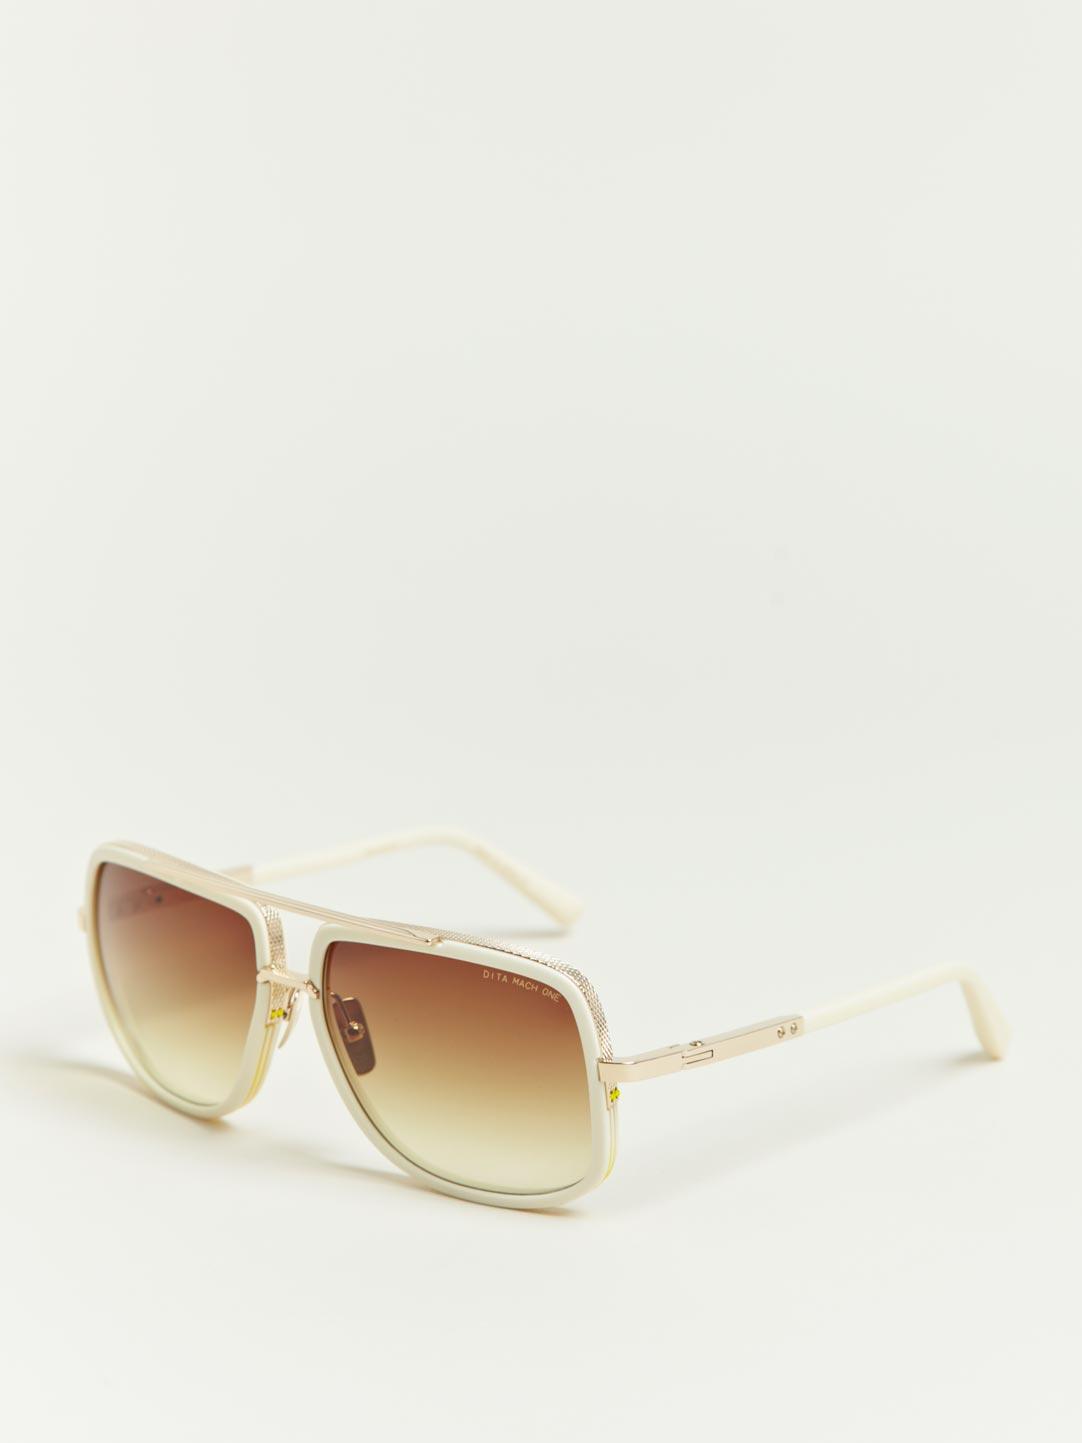 11b9b641b4cc Lyst - DITA Matte Bone Mach One Sunglasses for Men